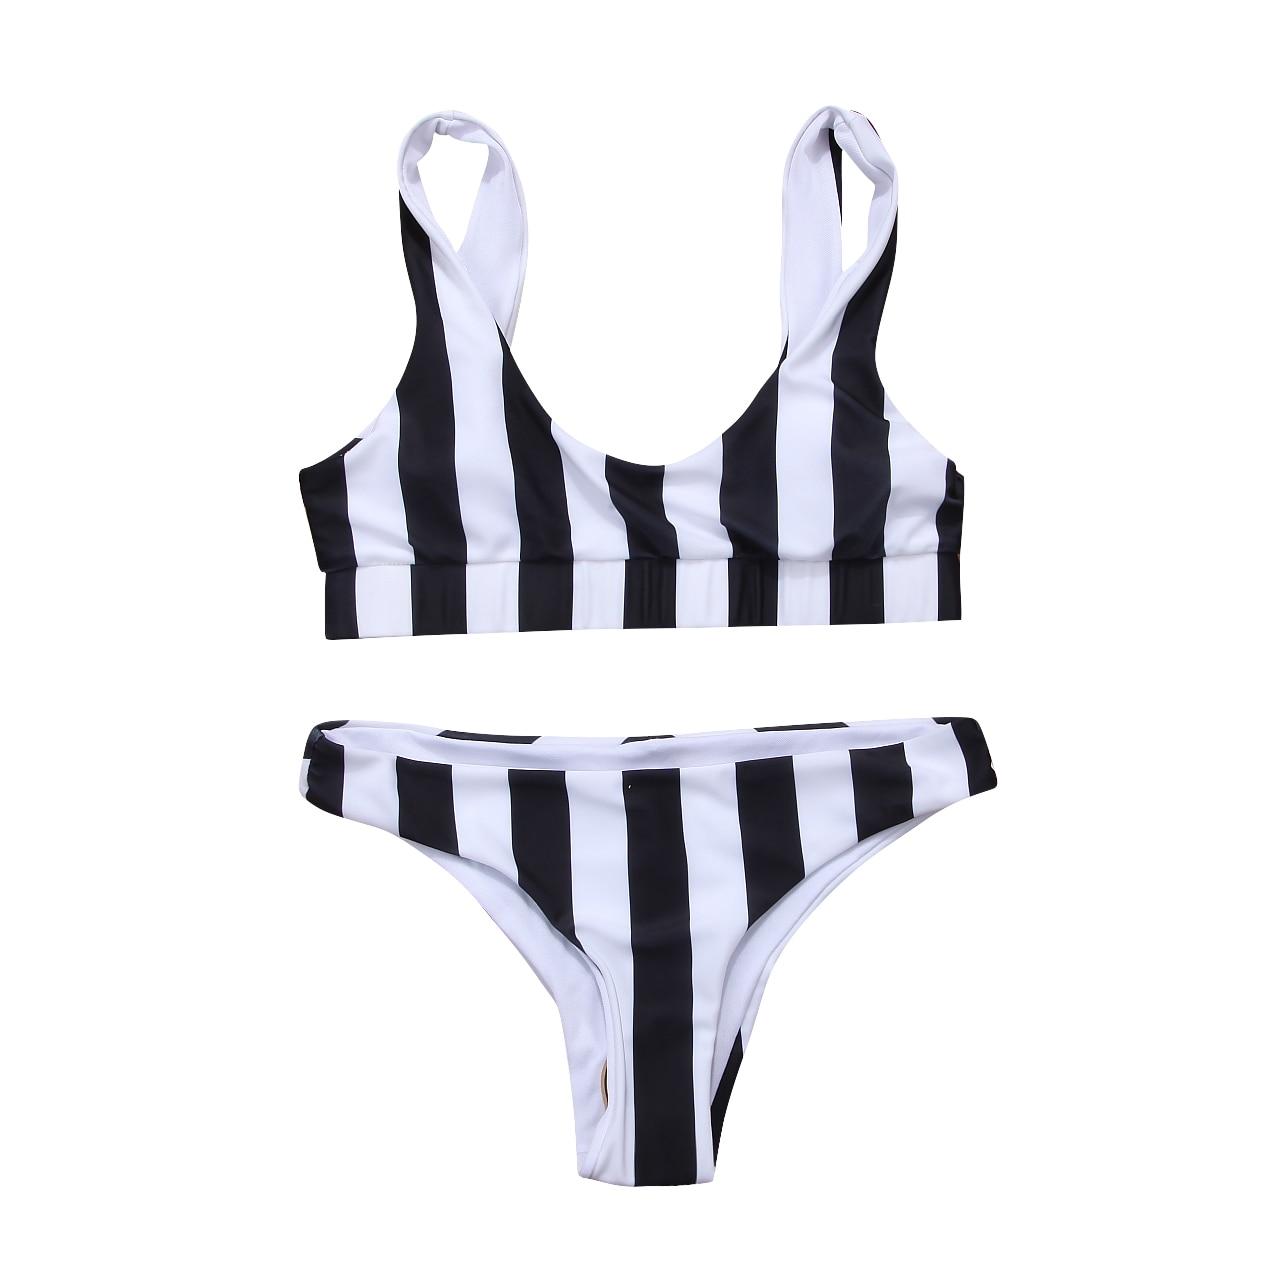 hirigin 2019 Bikini Set Women Swimwear Hot Stripes Push Up Padded Swimsuit Women Bathing Suit Beachwear Brazilian Biquini New